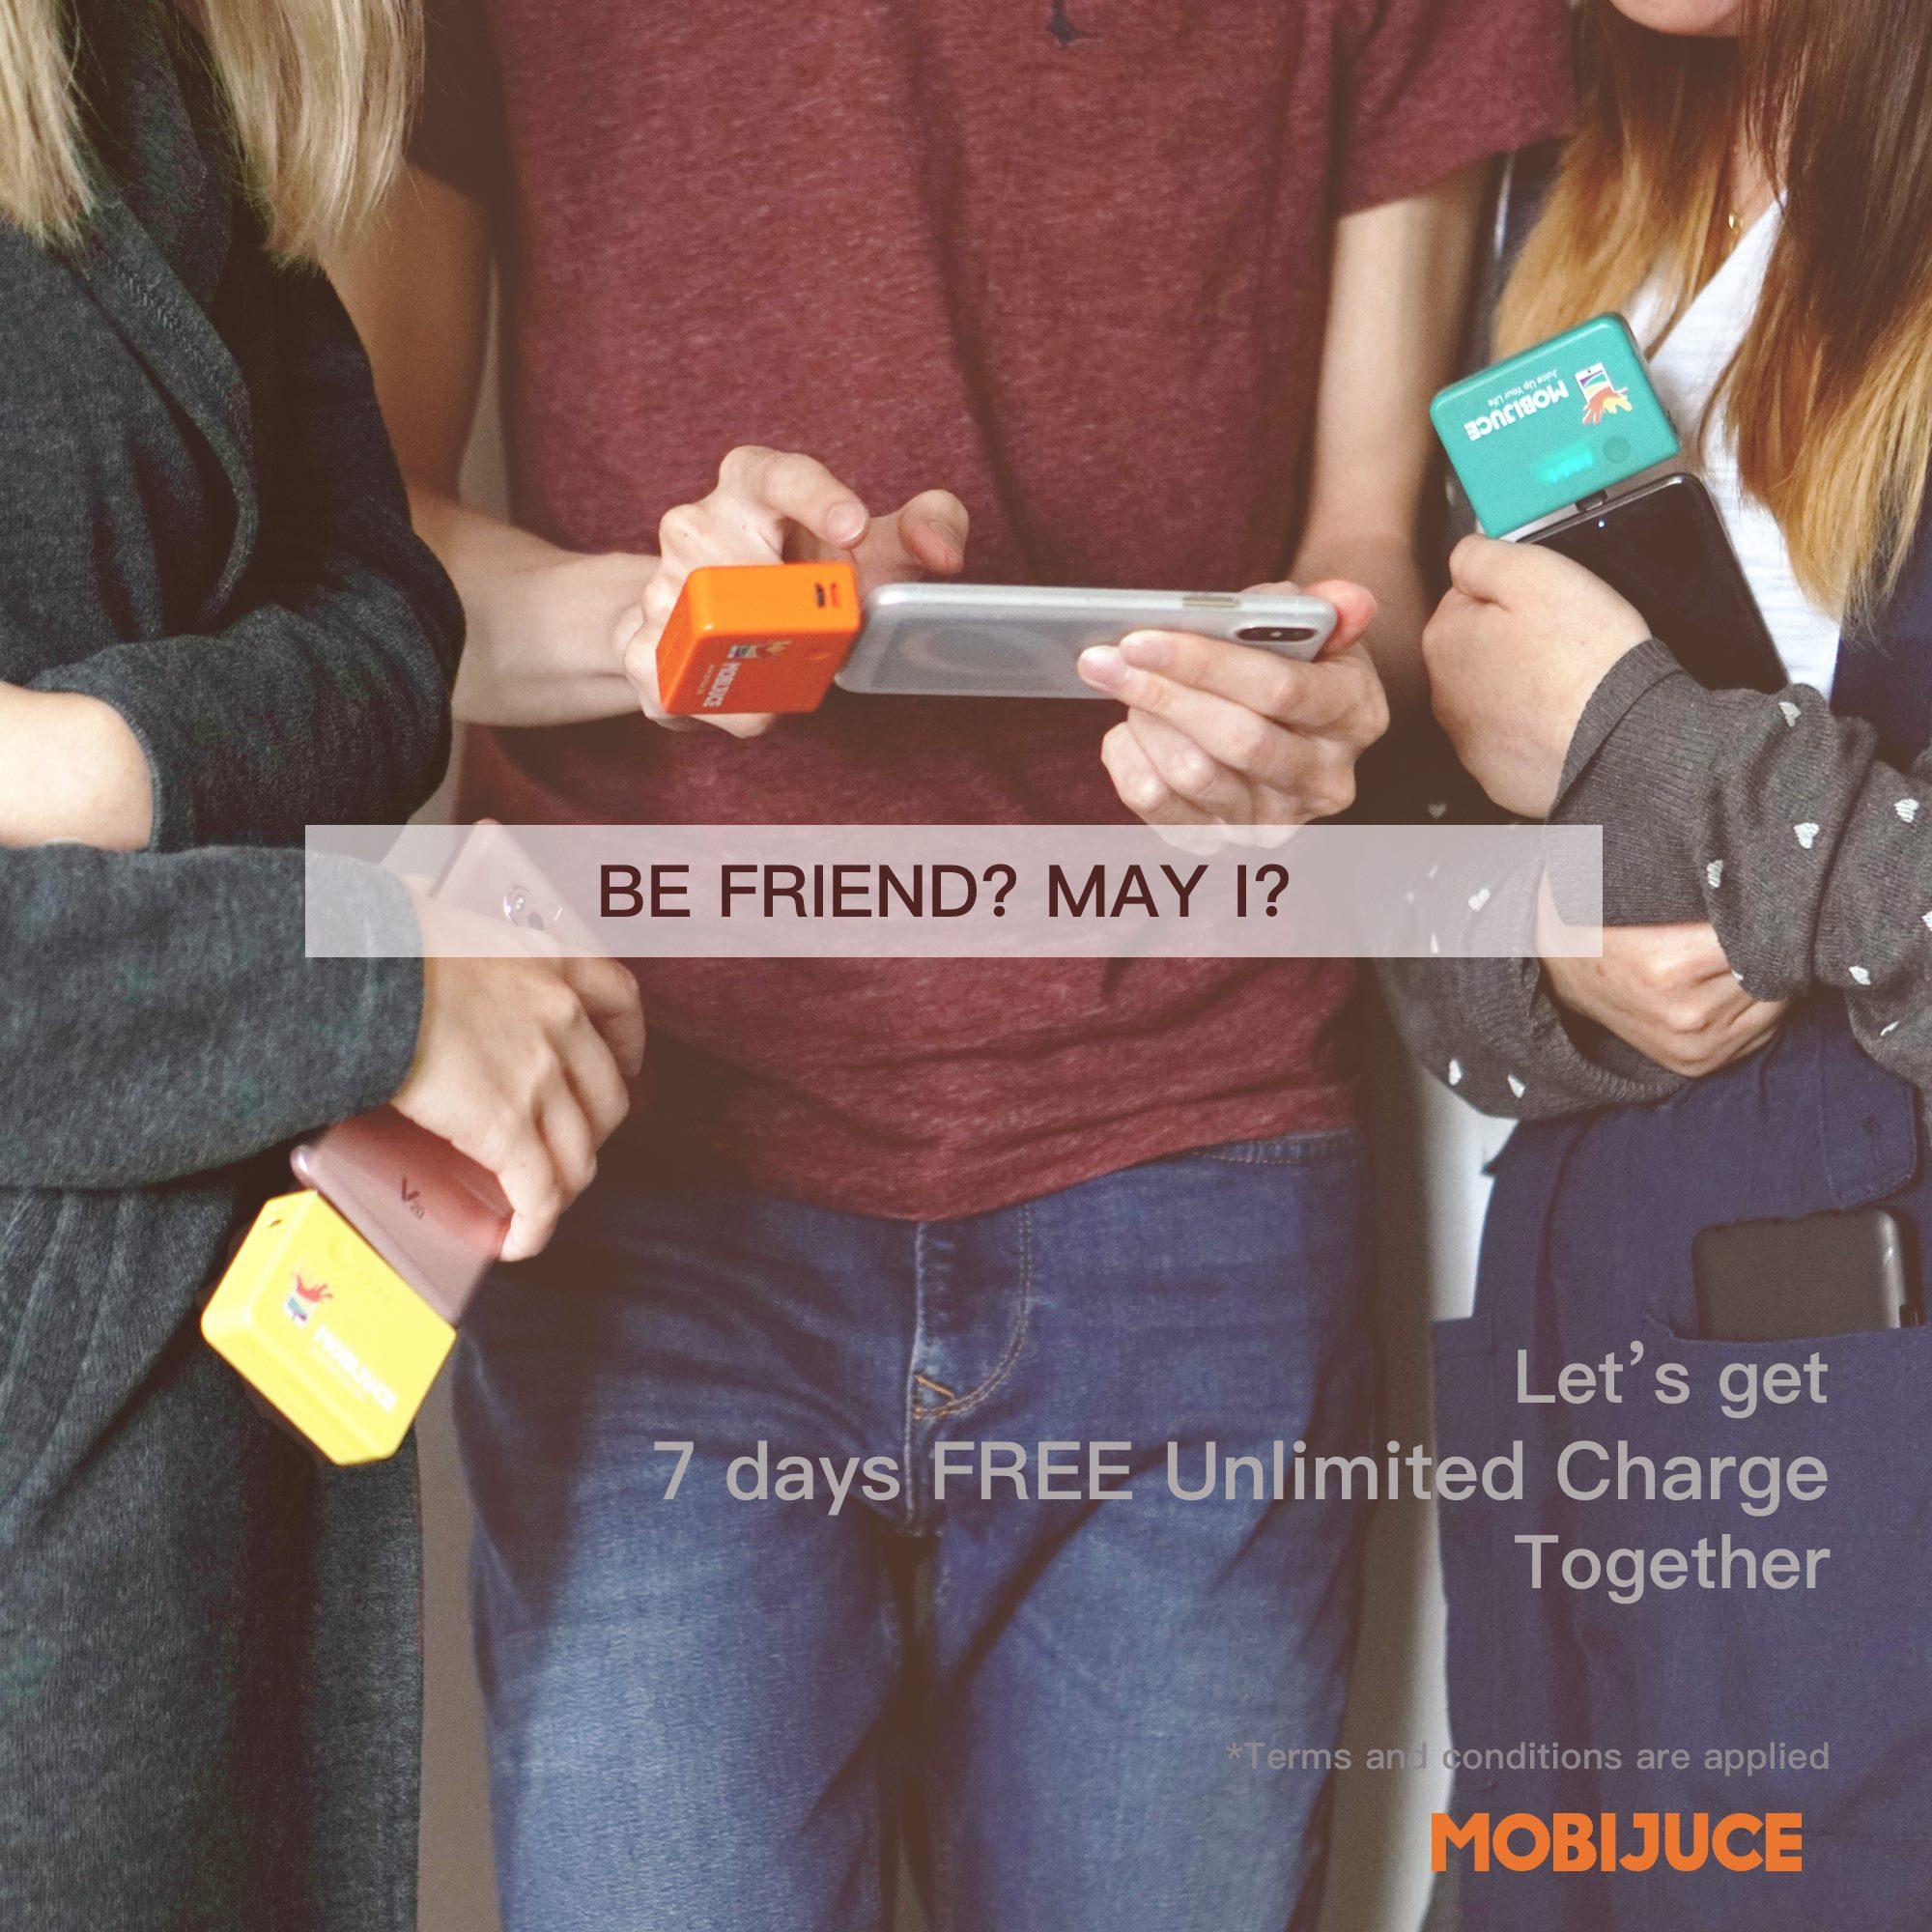 "⚡️邀請步驟⚡️ 1. 用戶登入MobiJuce應用程式後,到「免費充電」,按「邀請朋友」以發送下載應用程式連結給朋友。 2. 朋友完成下載及登記個人MobiJuce用戶後,到「新增優惠代碼」輸入邀請人專屬「邀請代碼」,並按「應用」後,朋友便成功換領「Be Friend? May I?新用戶7次免費使用」。 3. 朋友完成付款設定後,到任何JuceBox借電,並選取該優惠劵,即可開始免費使用*。完成借用步驟後,「Be Friend? May I?新用戶7次免費使用」優惠劵便會自動新增至邀請人的「我的優惠」中^。  *新用戶綁定信用卡後,即可取得$20免費充電額。若選擇不綁定信用卡,可到「我的錢包」中「增值」不少於$149充電額,以供7次免費使用後借電之用。  ^所有邀請步驟需要於5月內完成,才可換領「Be Friend? May I?新用戶7次免費使用」優惠劵,並於每次借用時選取該優惠劵方可使用。優惠有效日期為輸入優惠代碼日期起一年內使用,請注意每次借用時間超過24小時,系統會自動增值$129並留待日後使用。若每次借用總時間超過72小時,系統會從""我的錢包""扣取該129,以作行政費用。每次只可以使用一張有效優惠劵。不論邀請人或朋友借電時,皆需完成付款設定,並確保「我的錢包」內有$20充電額。  *優惠受條款約束。MobiJuce擁有最終決定權。"